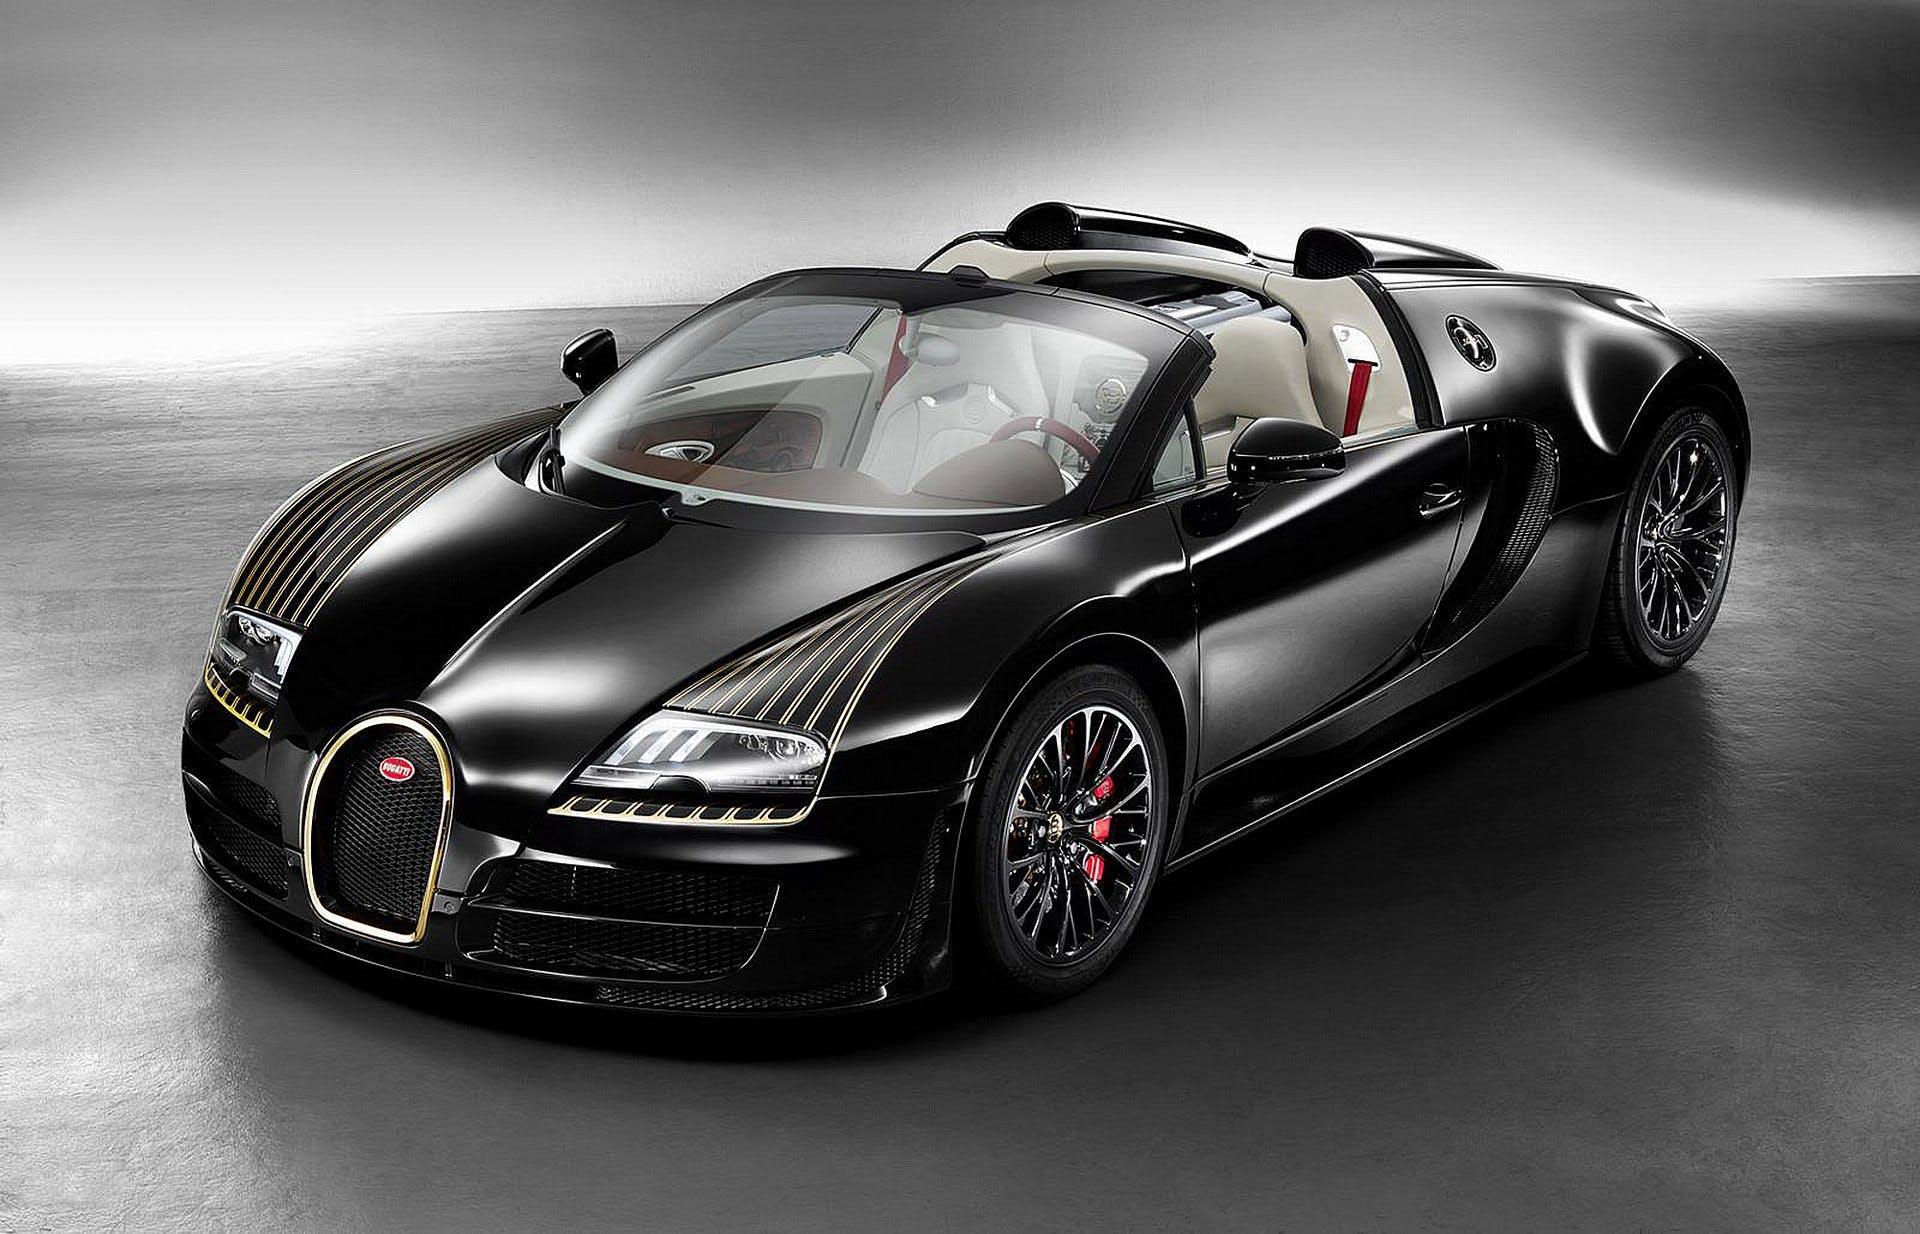 BugattiVeyron16.4GrandSportVitesseBlackBess-005